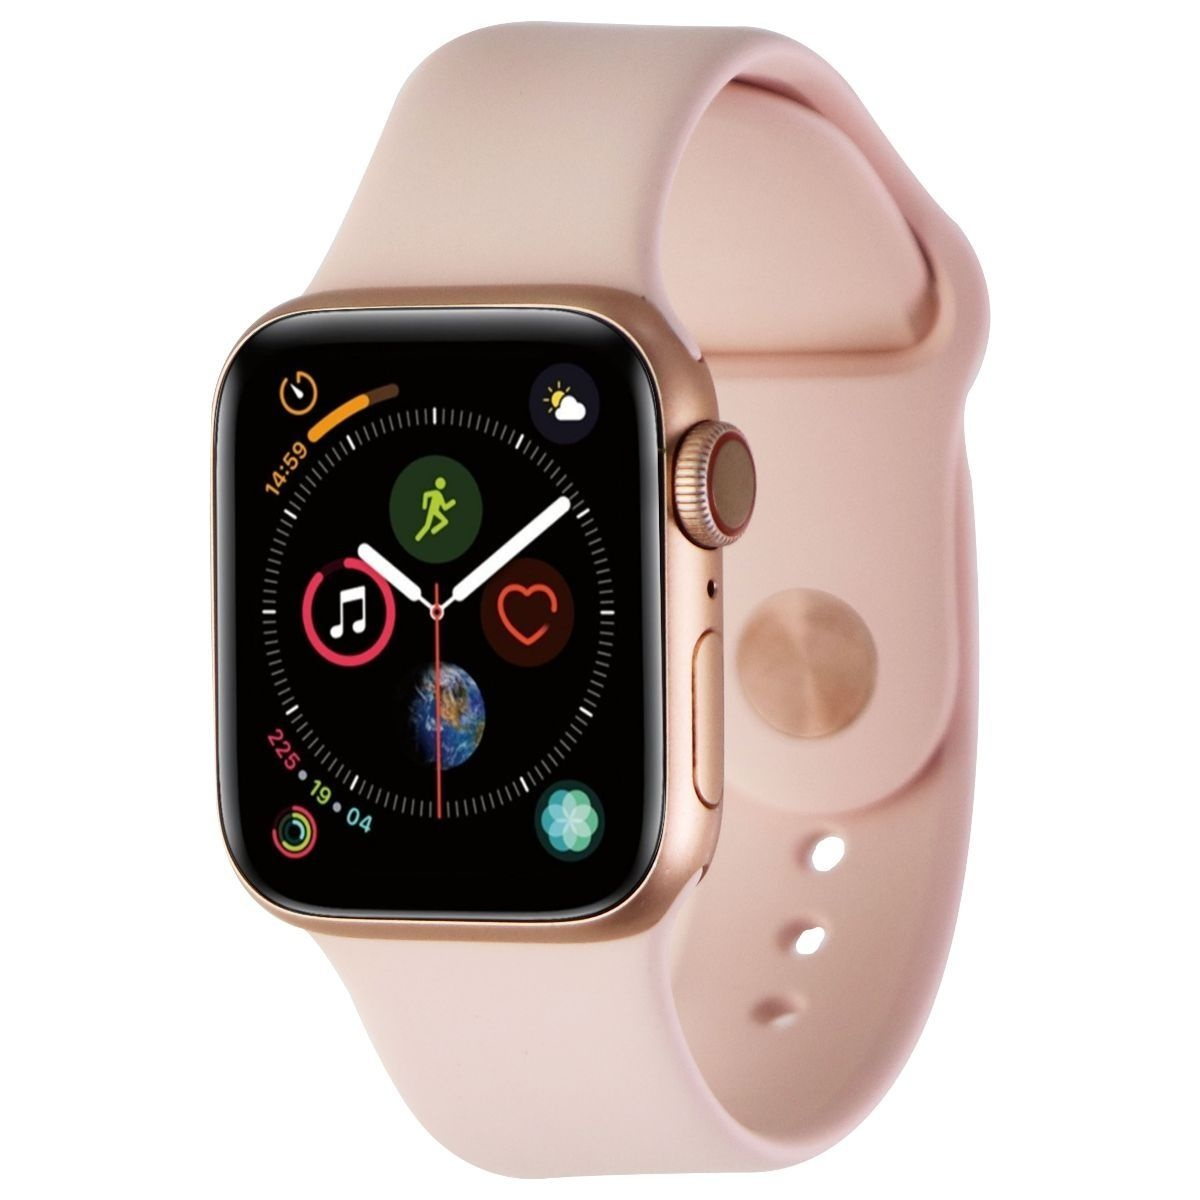 Apple Watch Series 4 A1975 40mm Aluminum Case Pink Sport Band Smart Watch For Sale Online Ebay